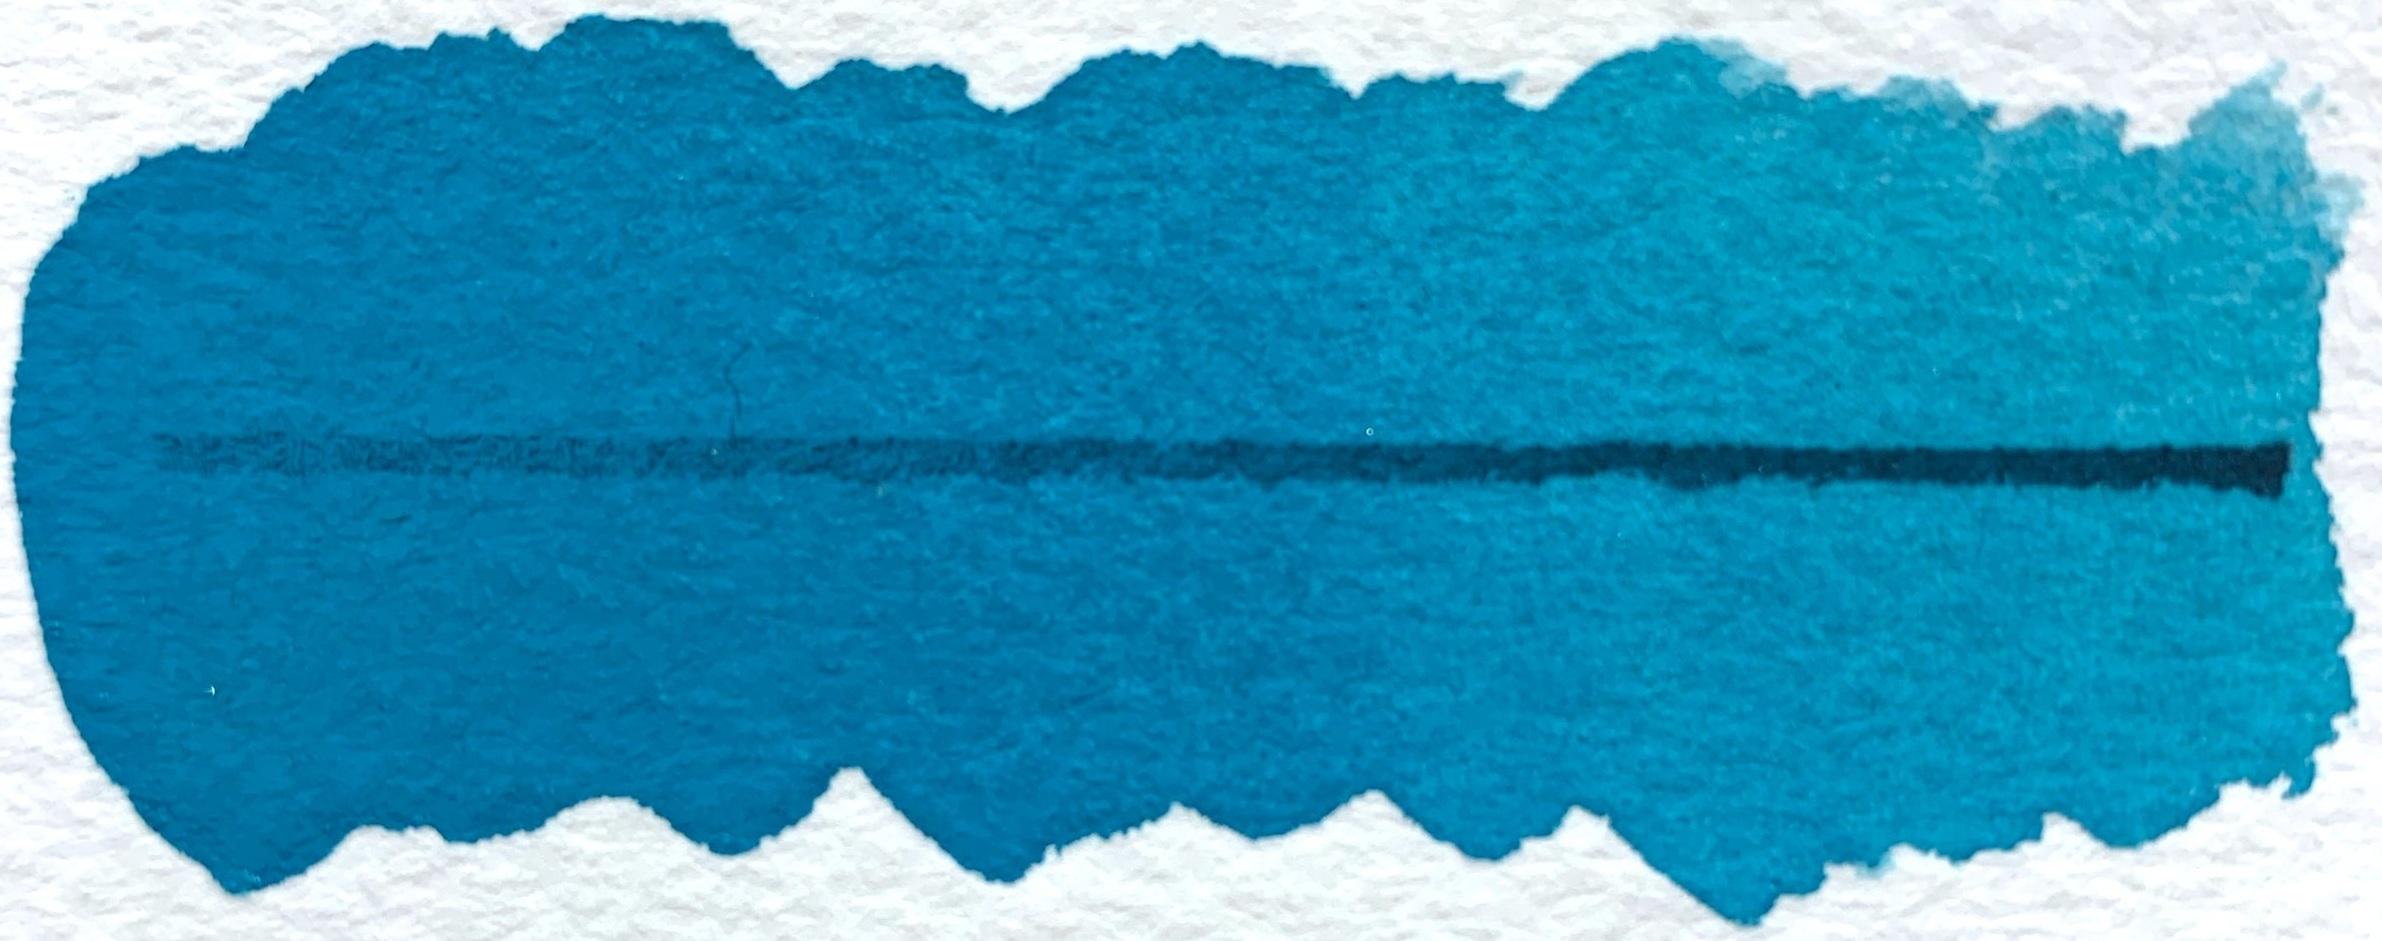 Tennessee Blues - PB28, semitransparent, good lightfastness, moderately staining